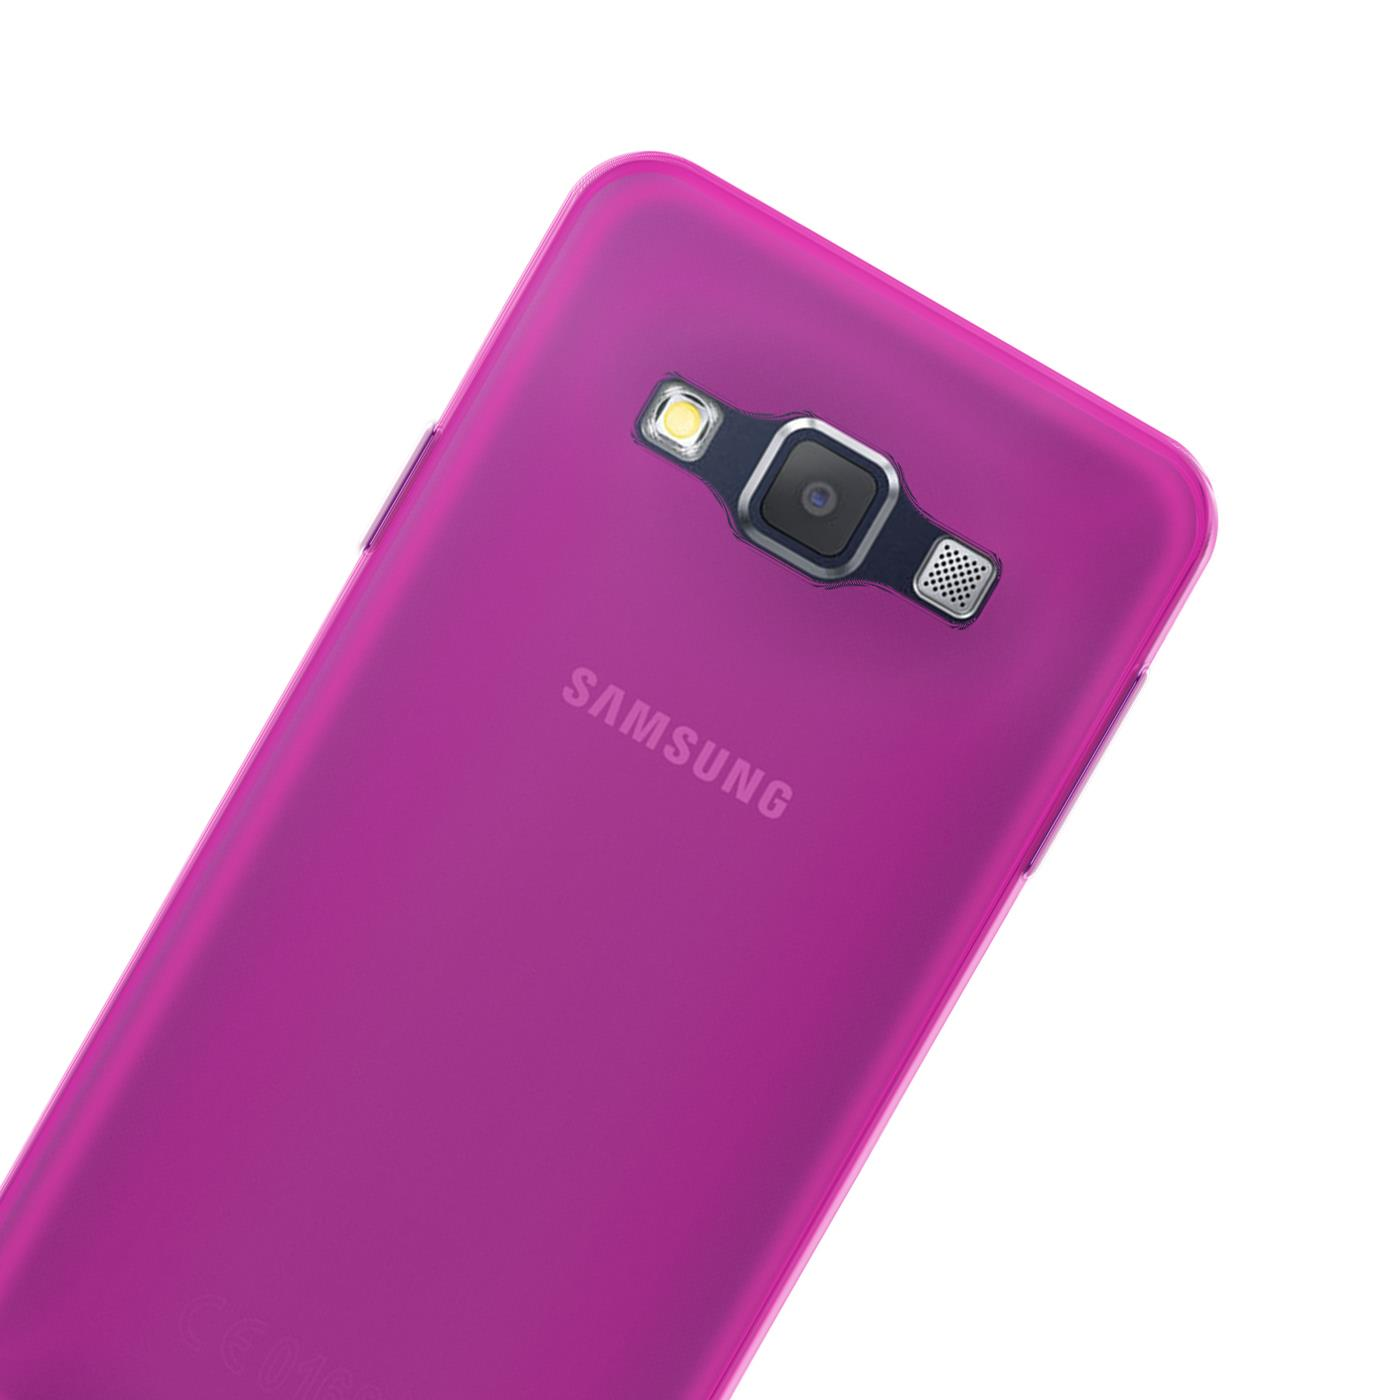 Samsung-Galaxy-A3-2015-Thin-Silicone-Clear-Case-Cover-Ultra-Slim-Shockproof-Gel Indexbild 24